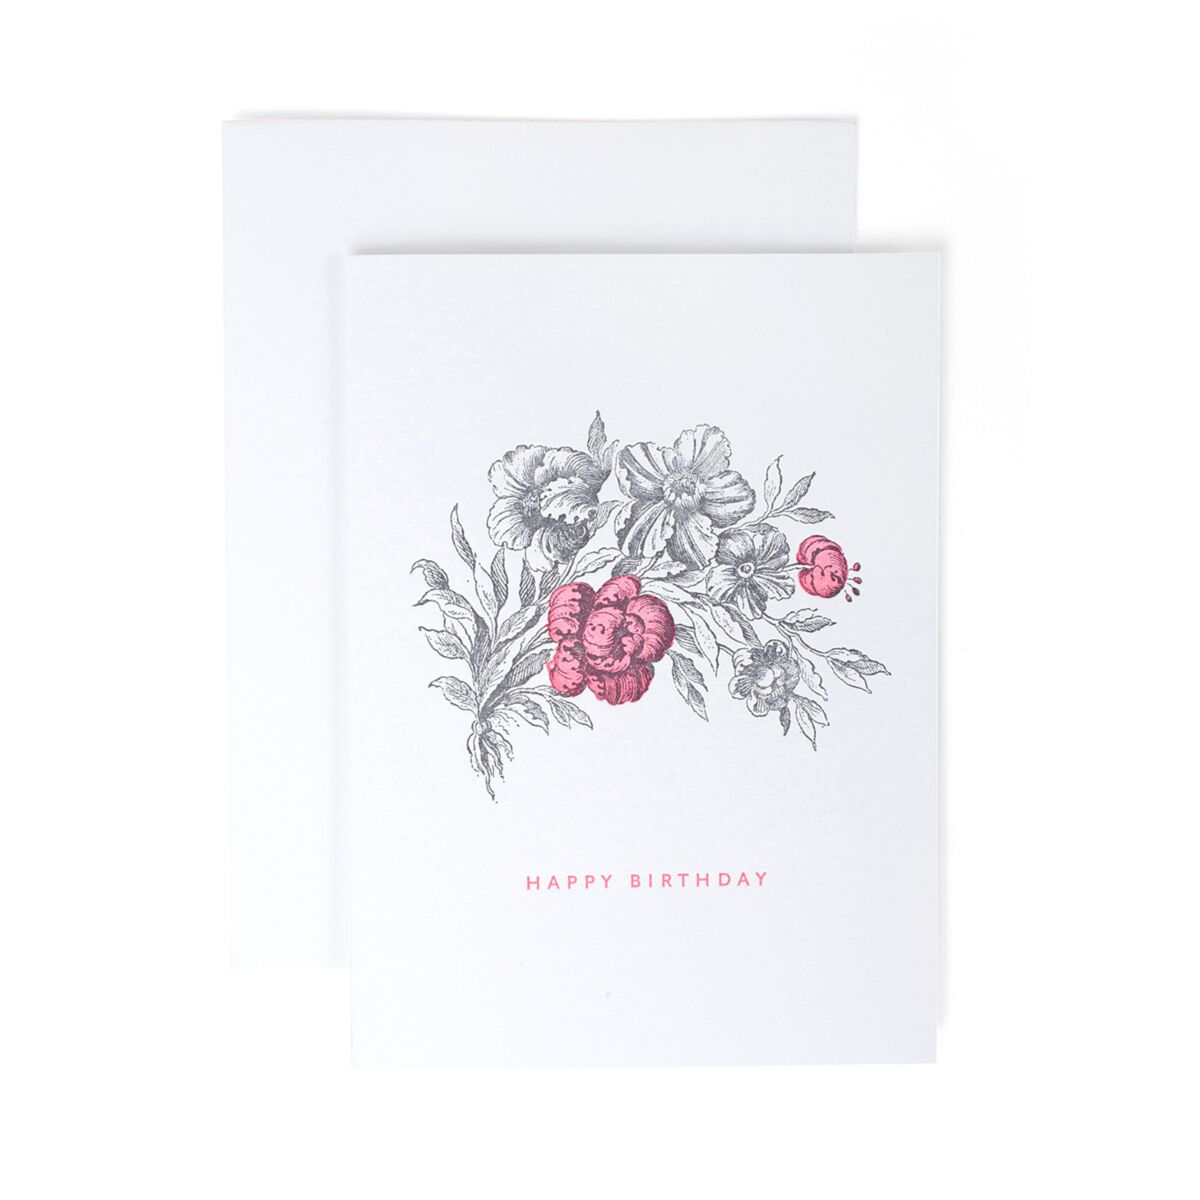 Hot Pink Flower Birthday Card image